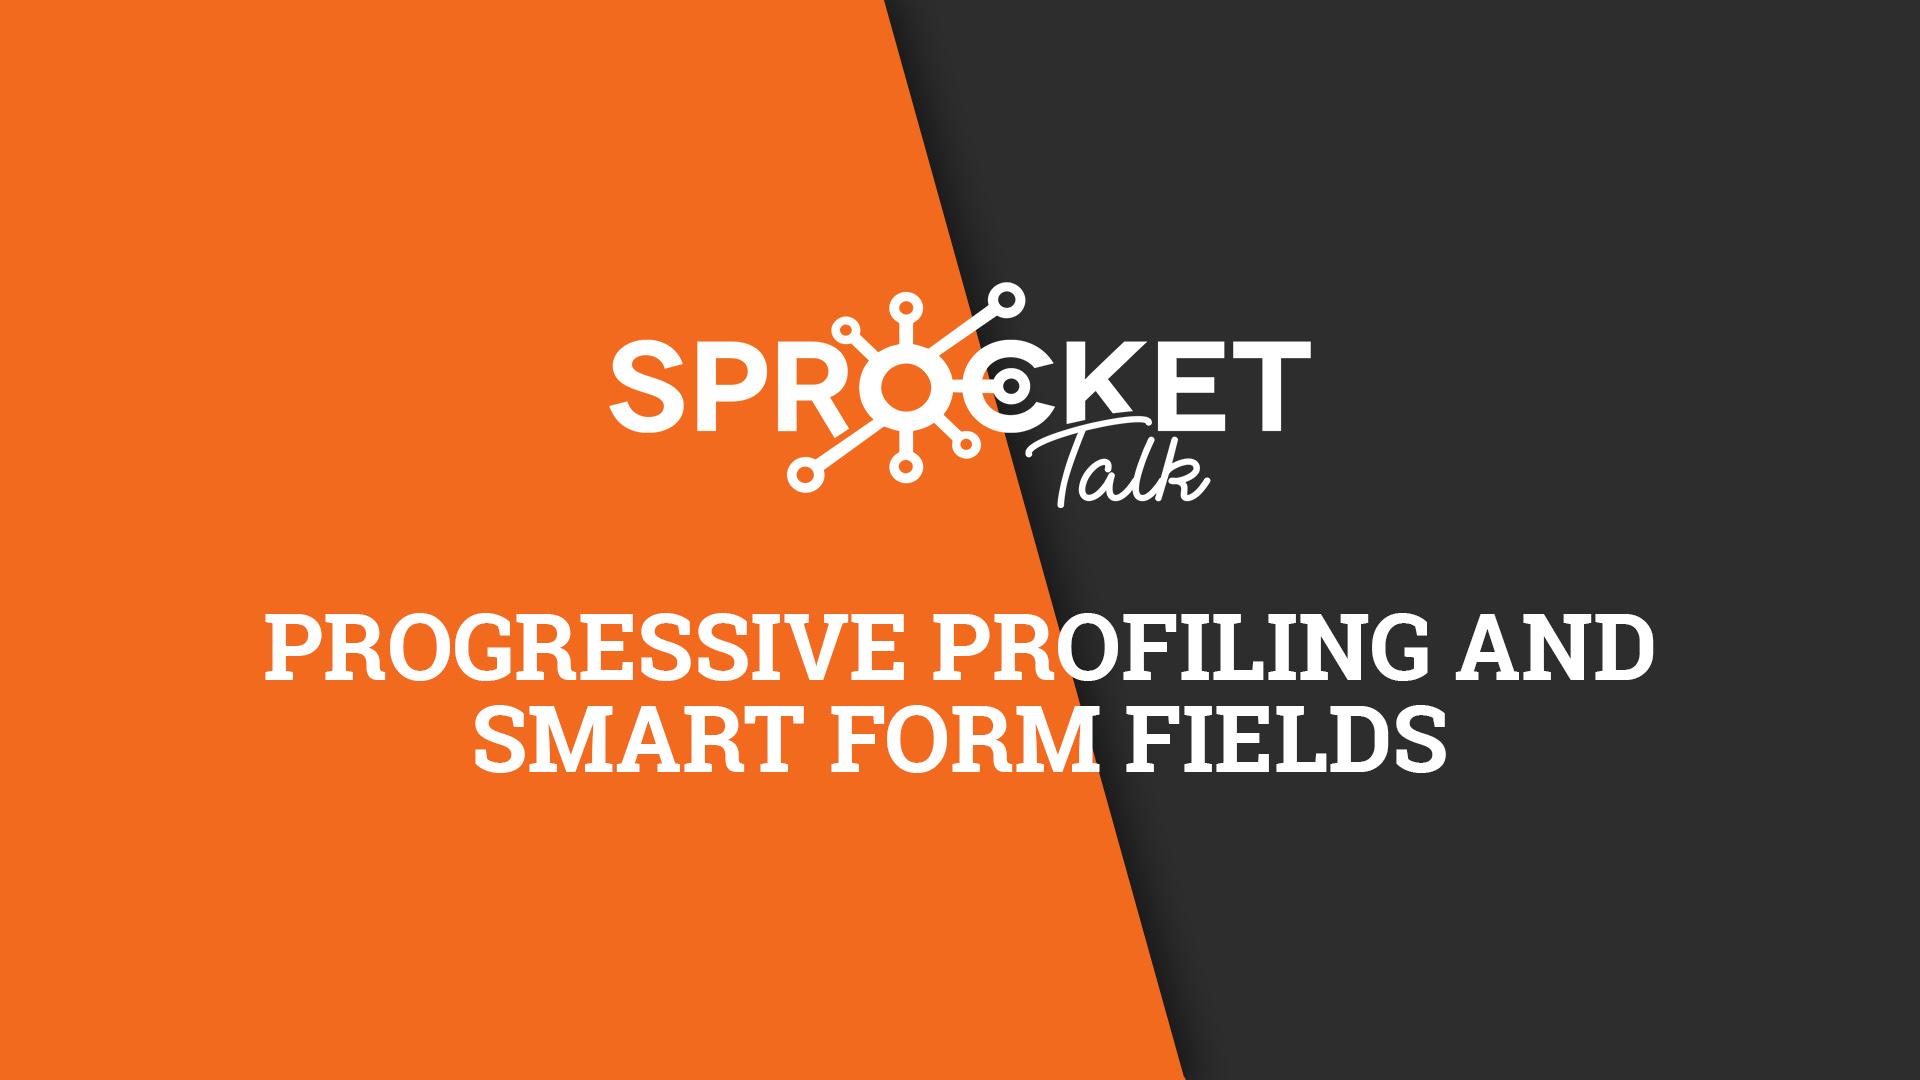 Progressive Profiling and Smart Form Fields